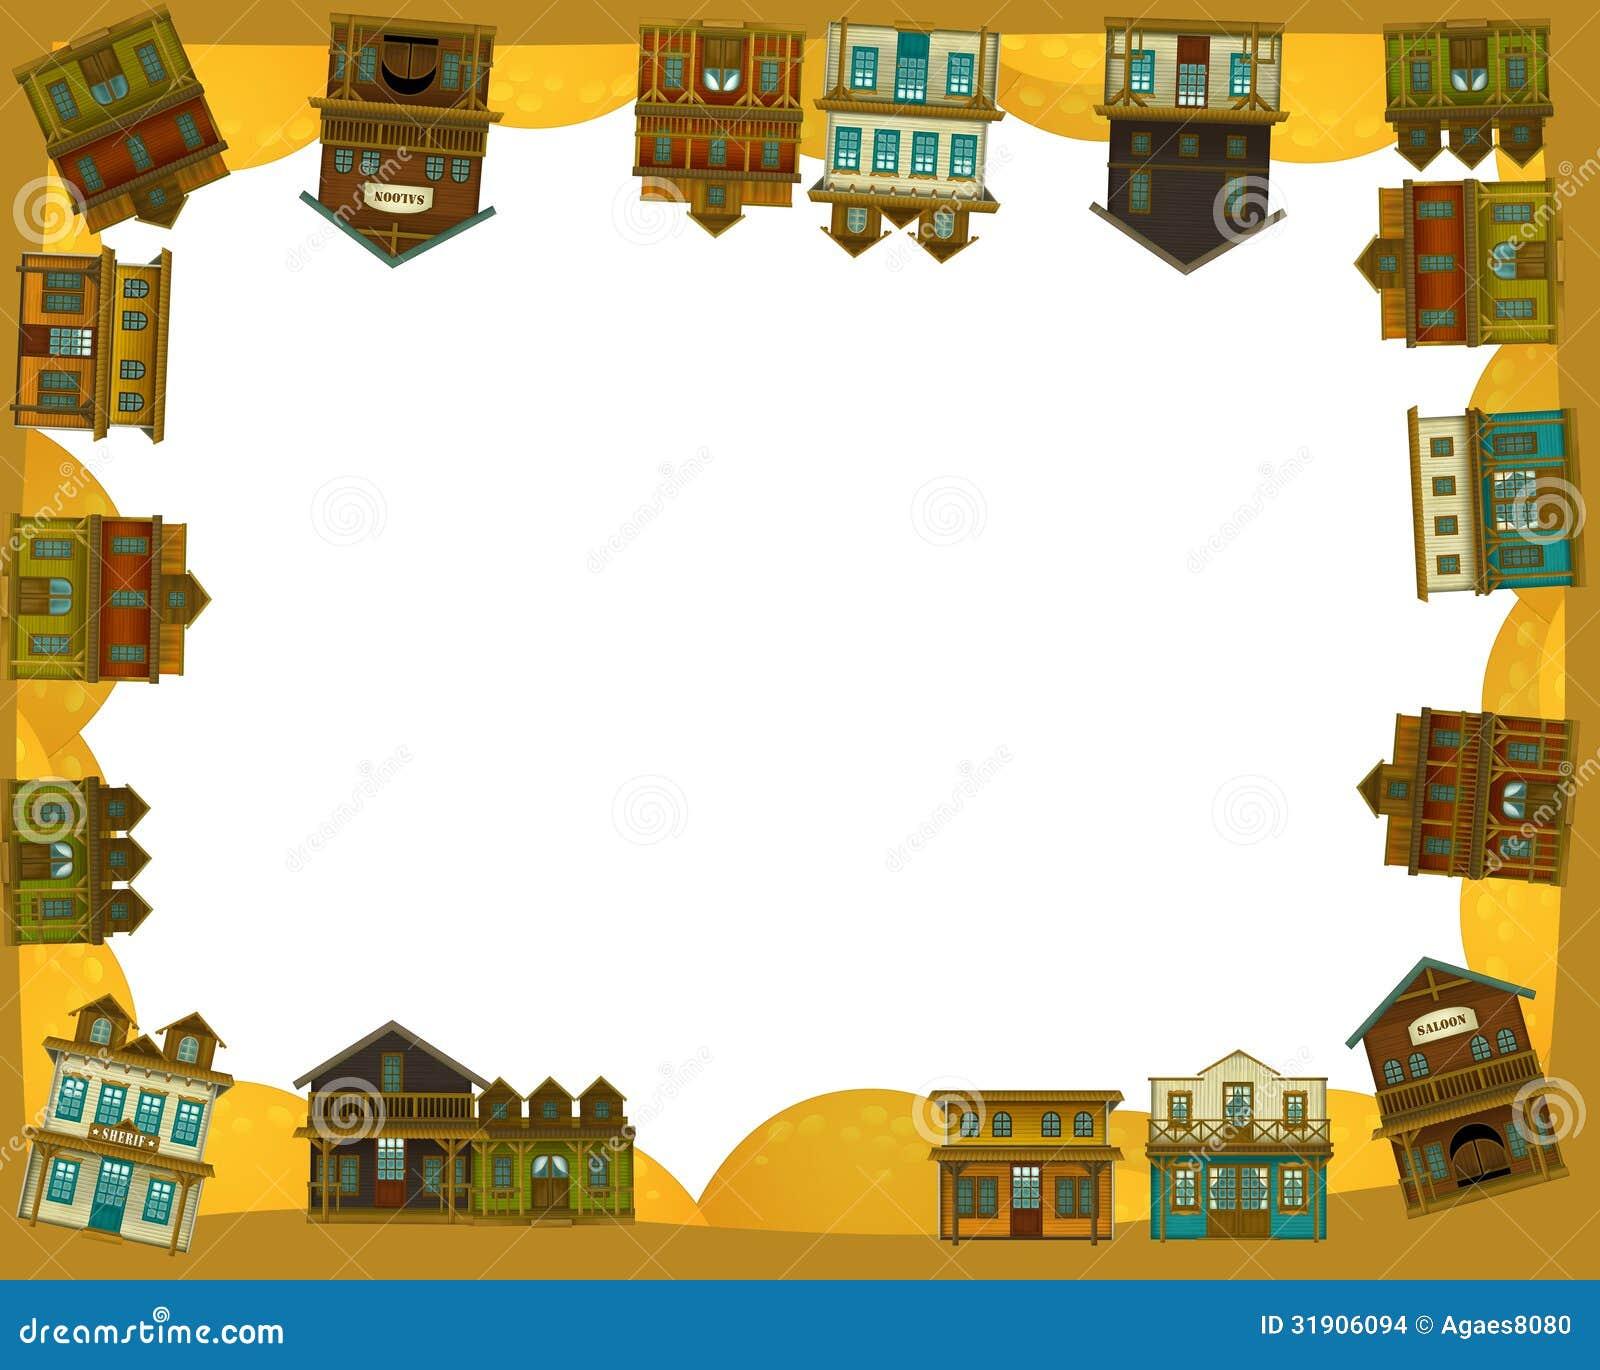 The Wild West Western Frame Border Template Illustration